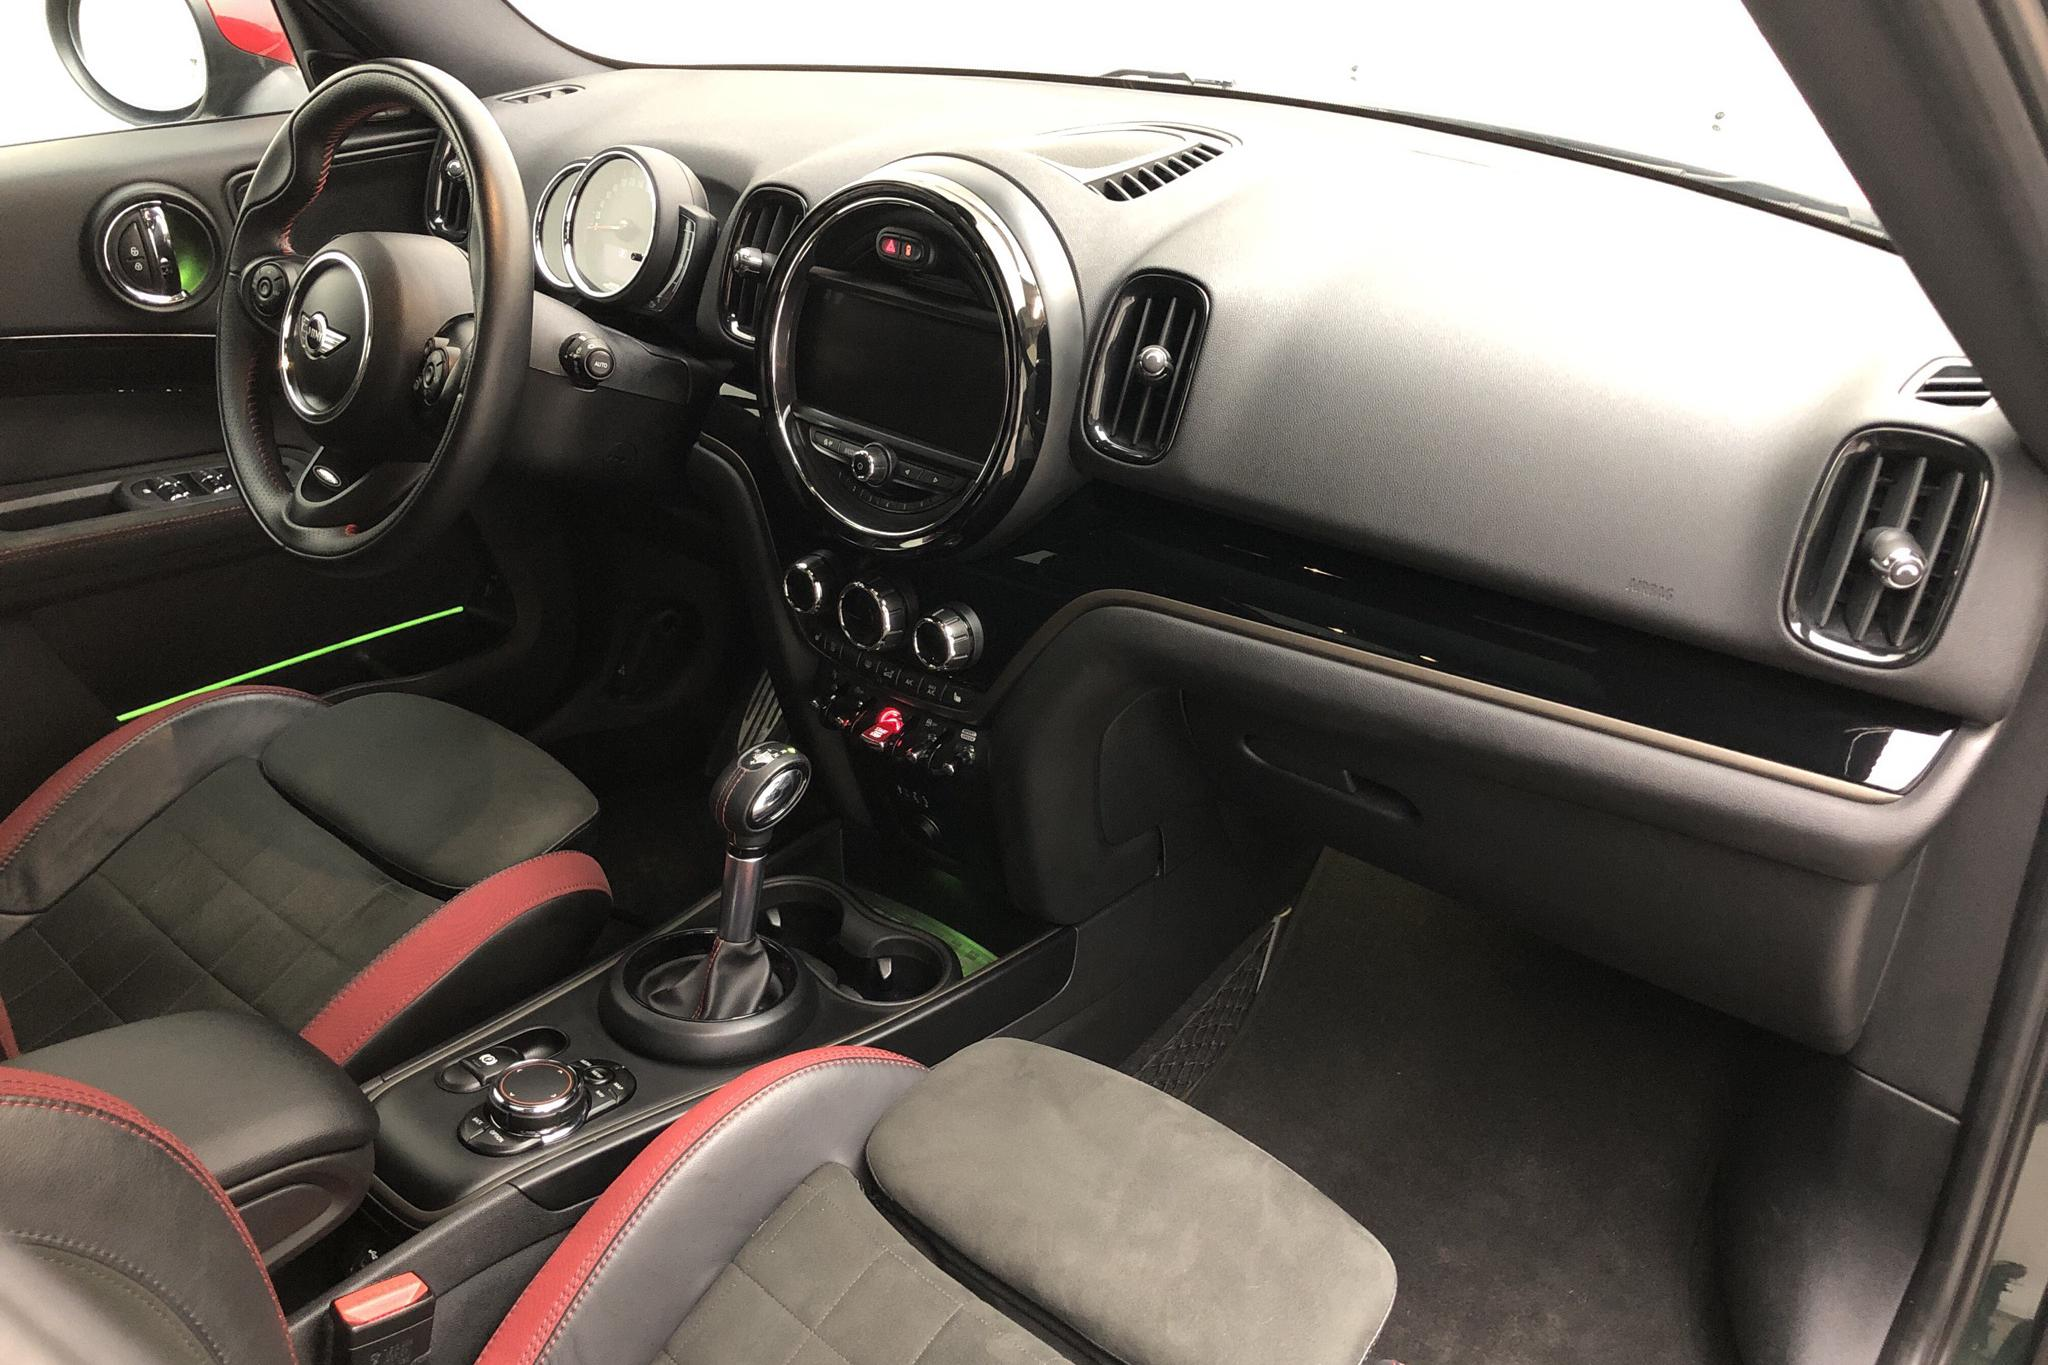 MINI John Cooper Works ALL4 Countryman, F60 (231hk) - 39 710 km - Automatic - green - 2017